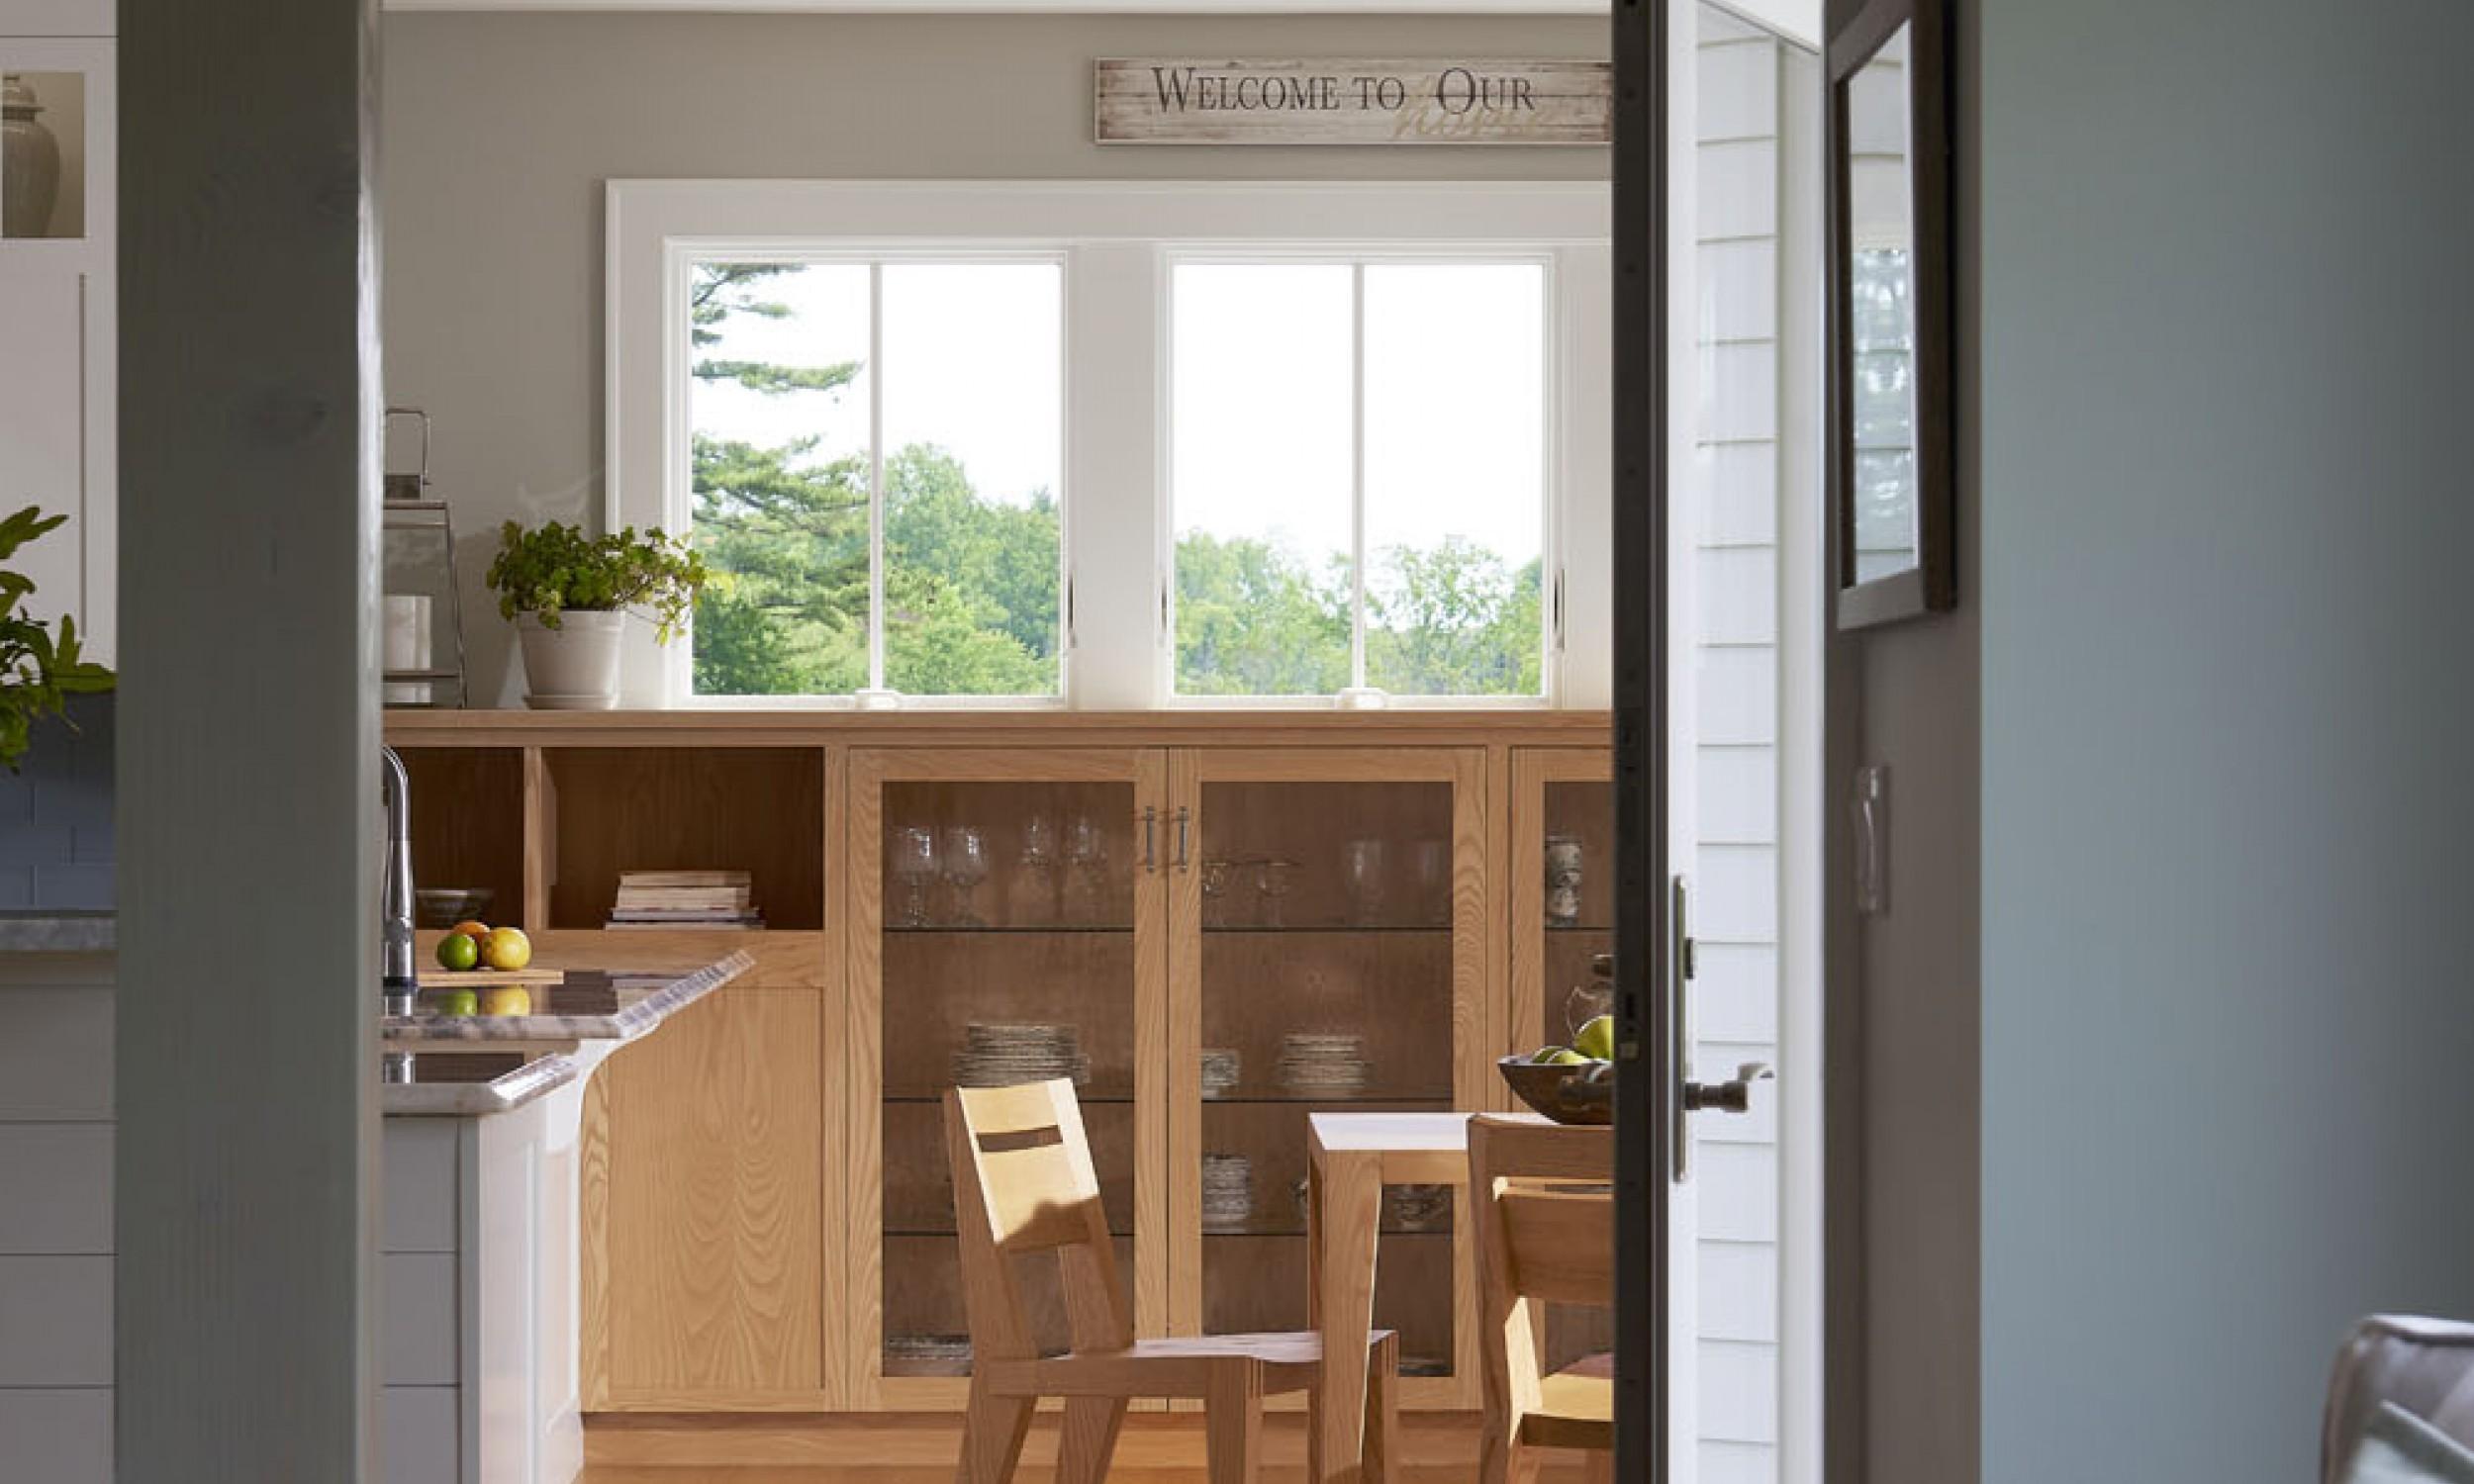 Dining Room, Tula Table, Angela Adams, Ash cabinets, Maine Architect